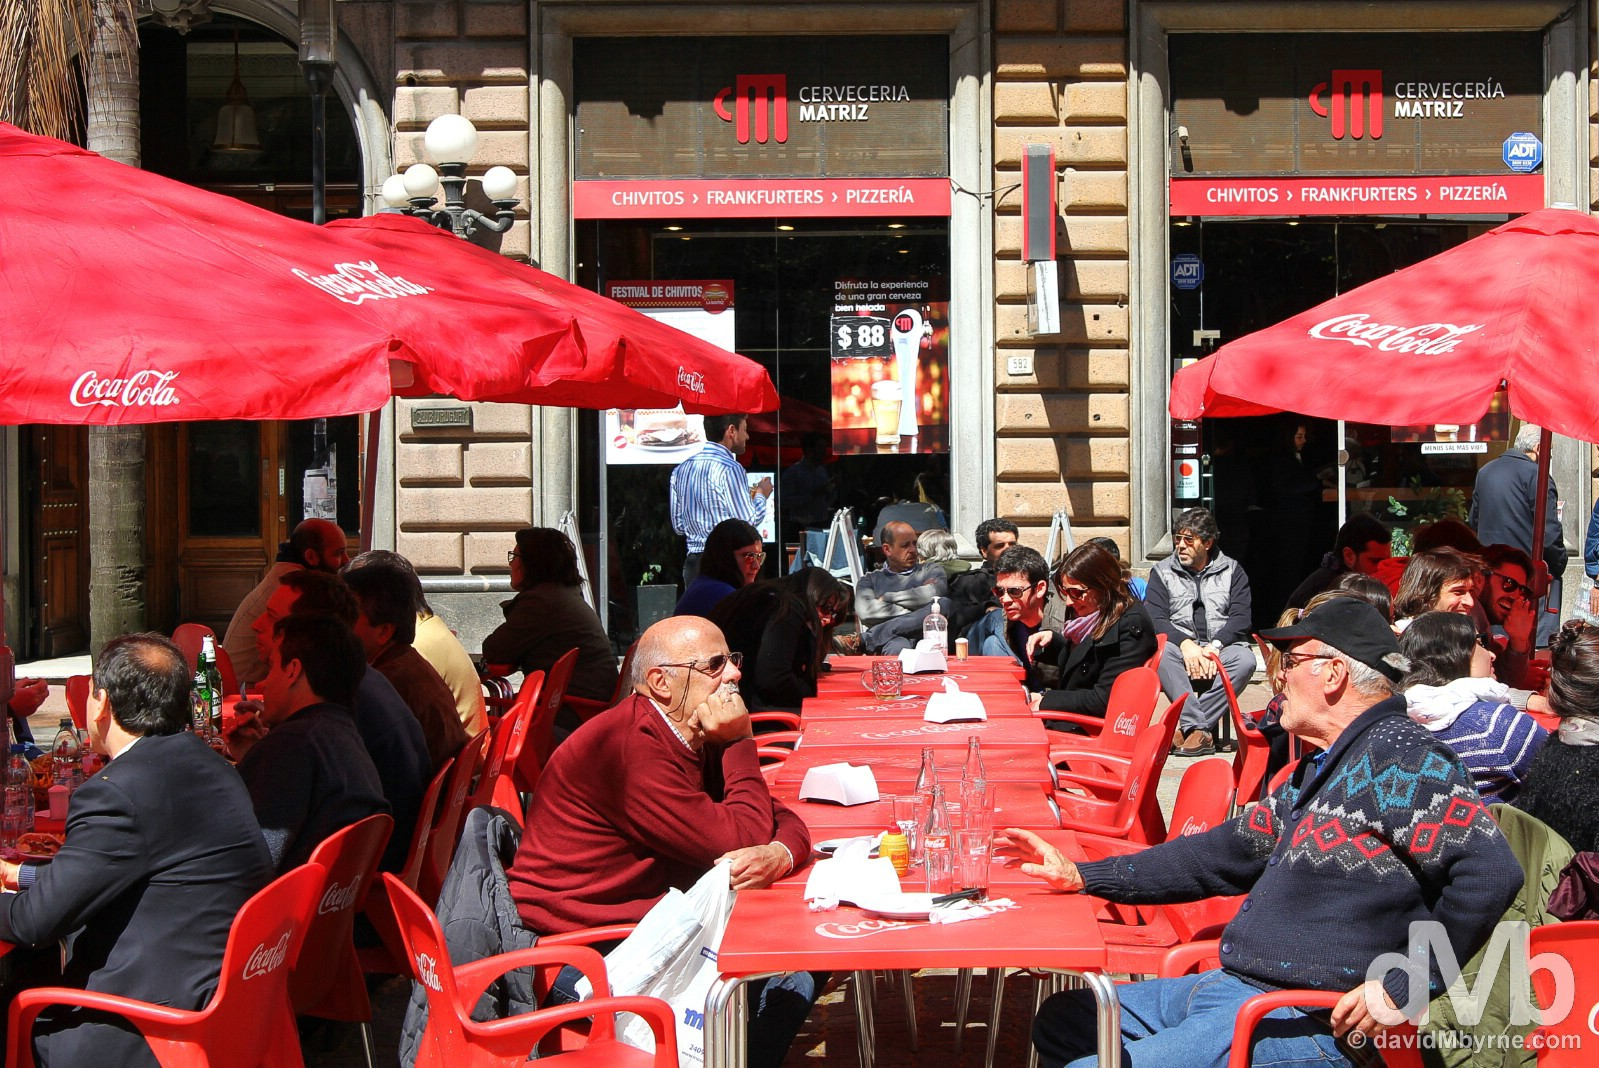 An outdoor cafe in Montevideo, Uruguay. September 18, 2015.